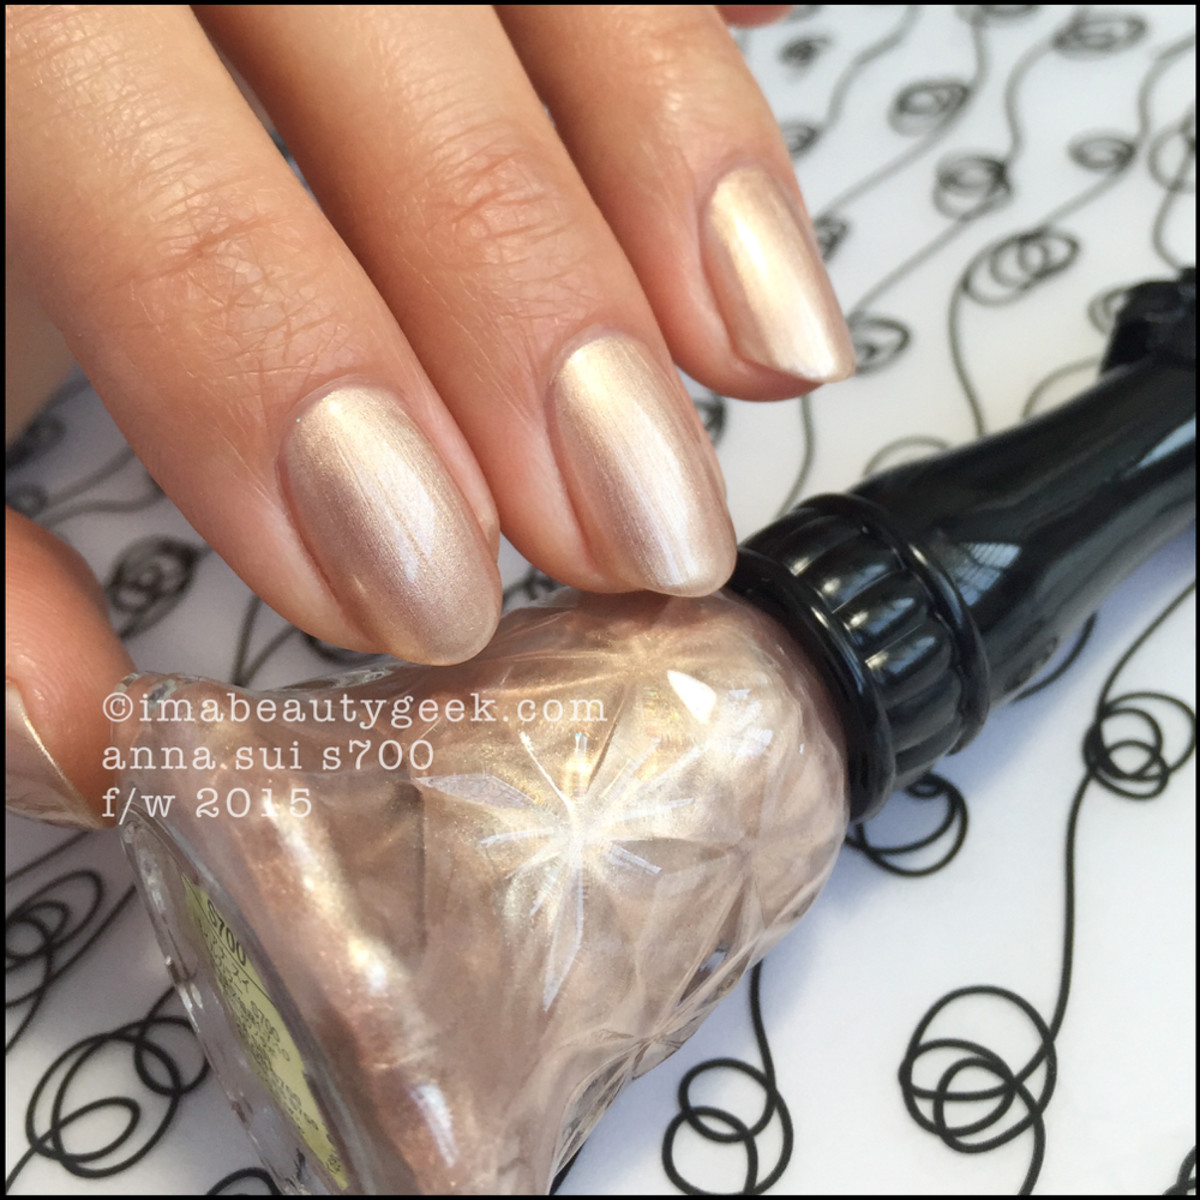 Anna Sui Nail Polish S700_Anna Sui Nail Color 2015